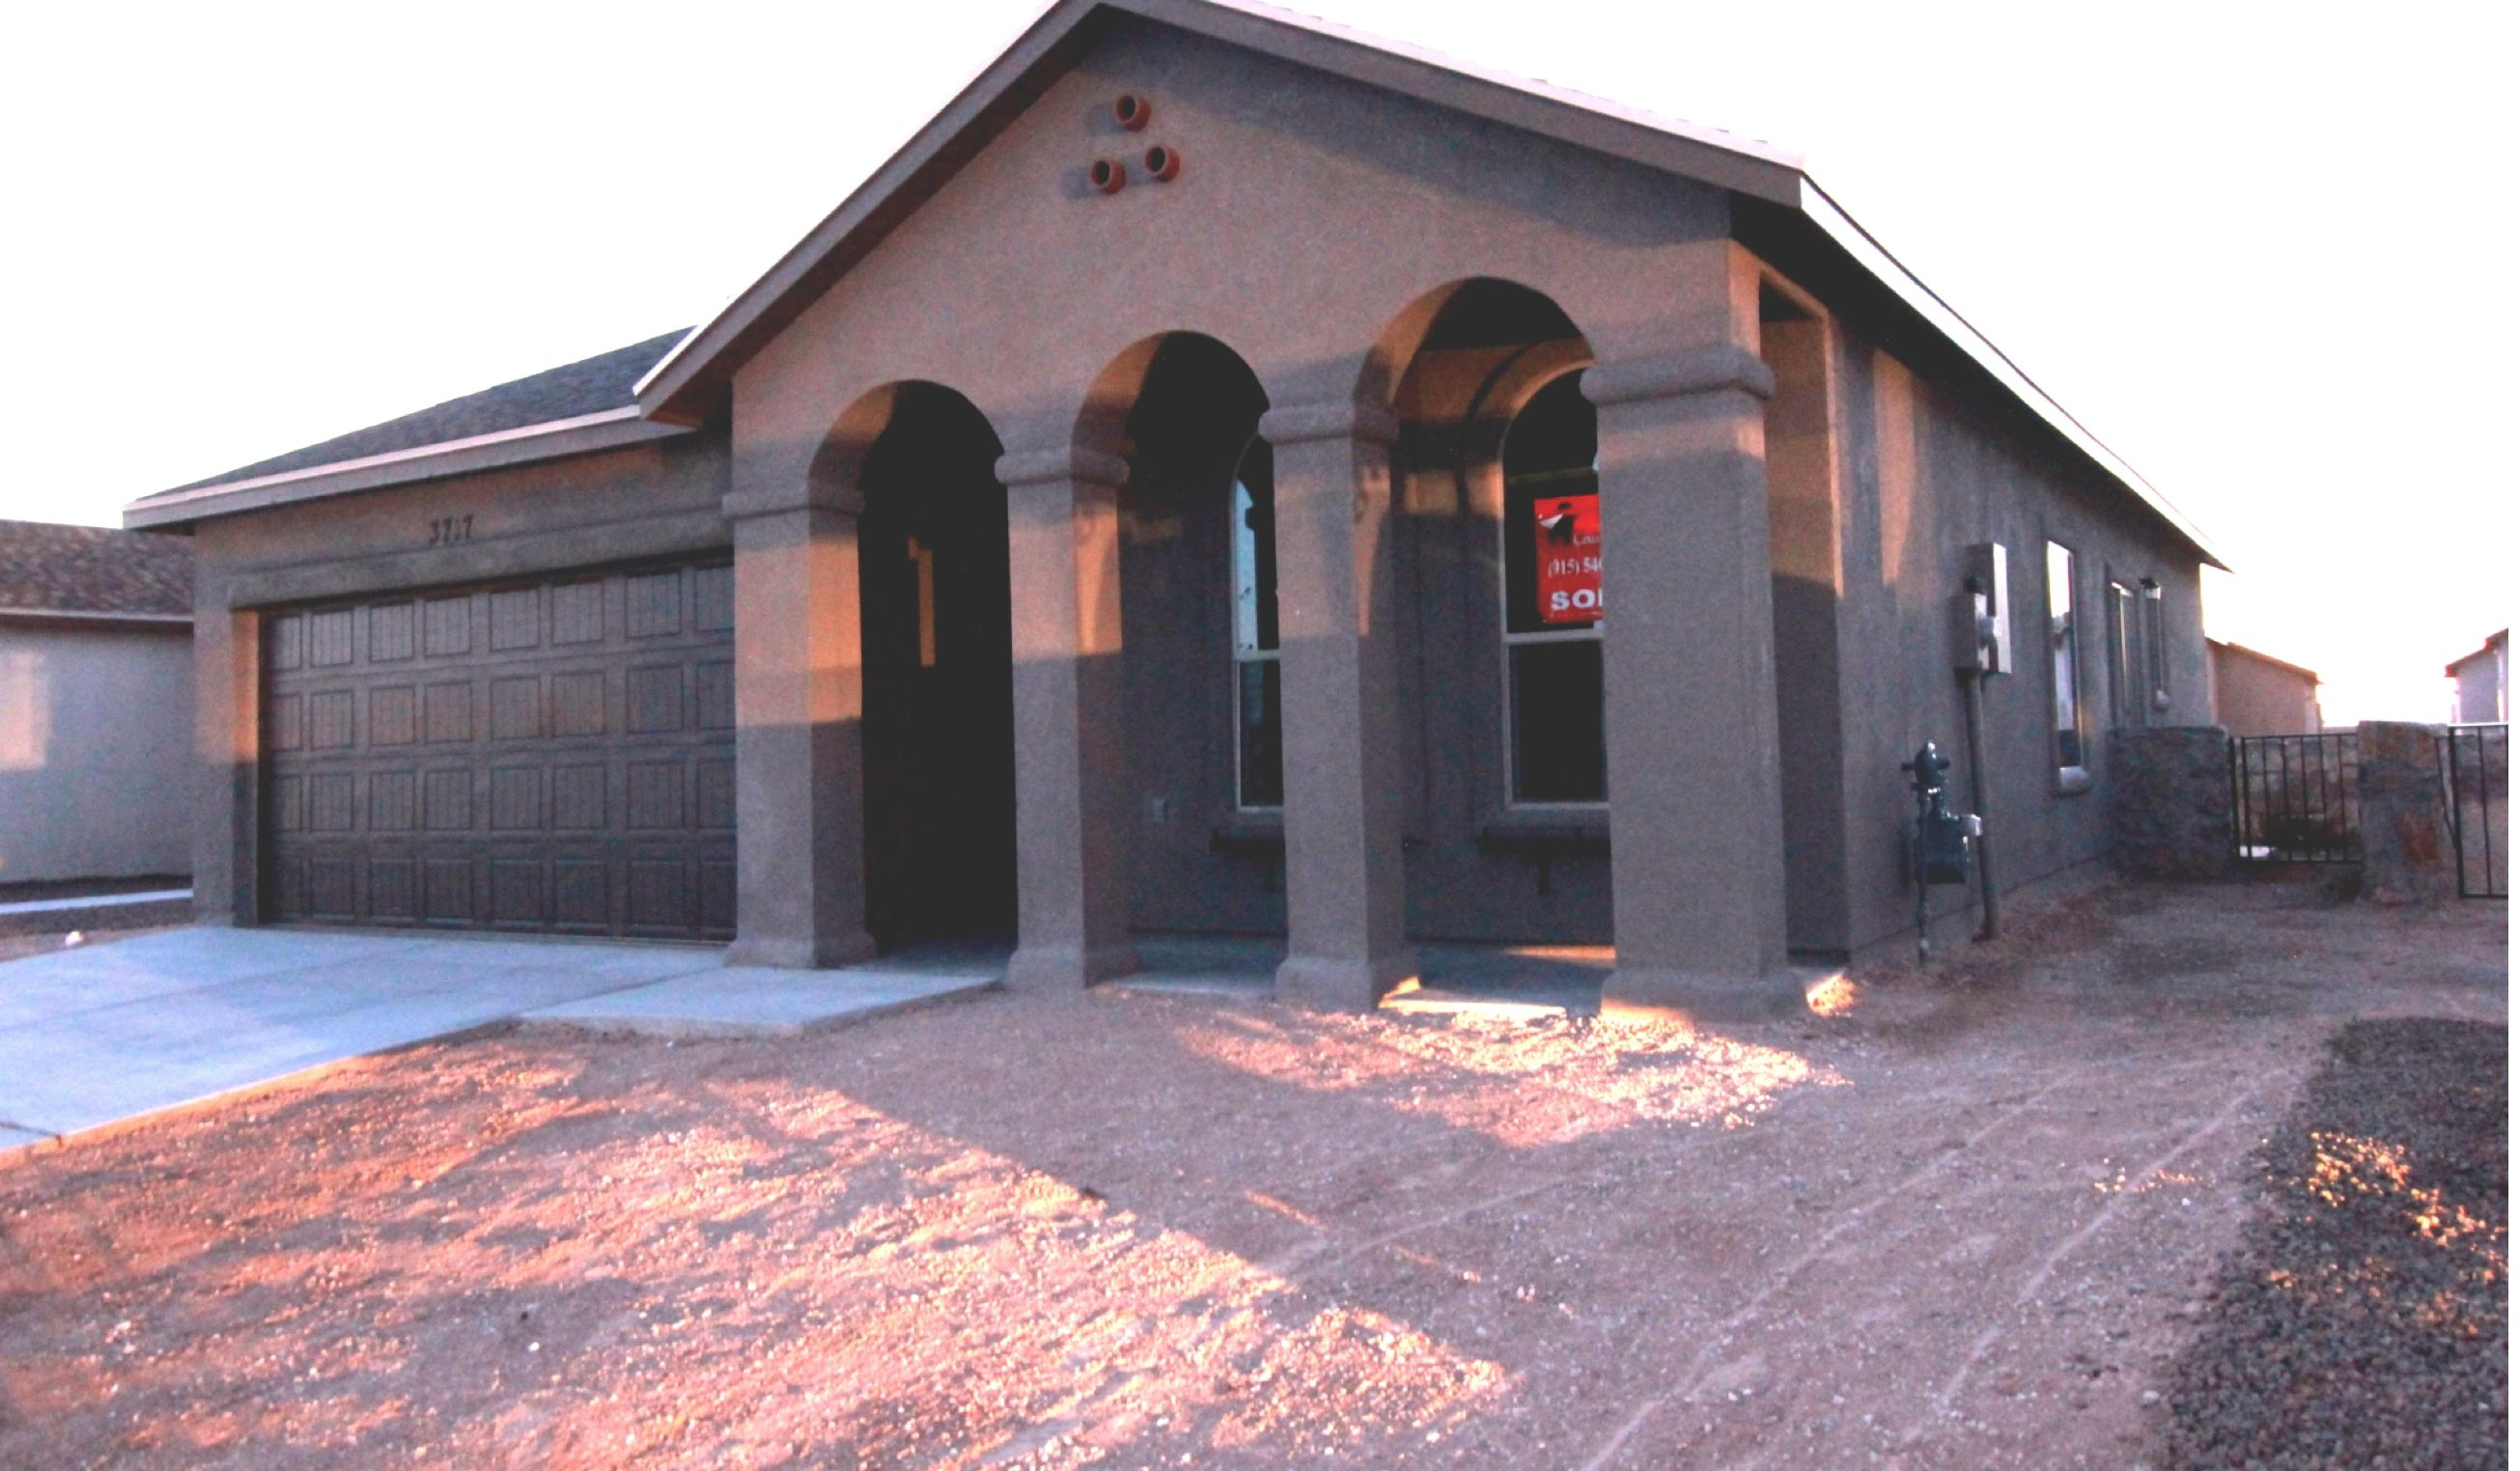 14348 CHRIS ZINGO, El Paso, Texas 79928, 3 Bedrooms Bedrooms, ,2 BathroomsBathrooms,Residential,For sale,CHRIS ZINGO,839985